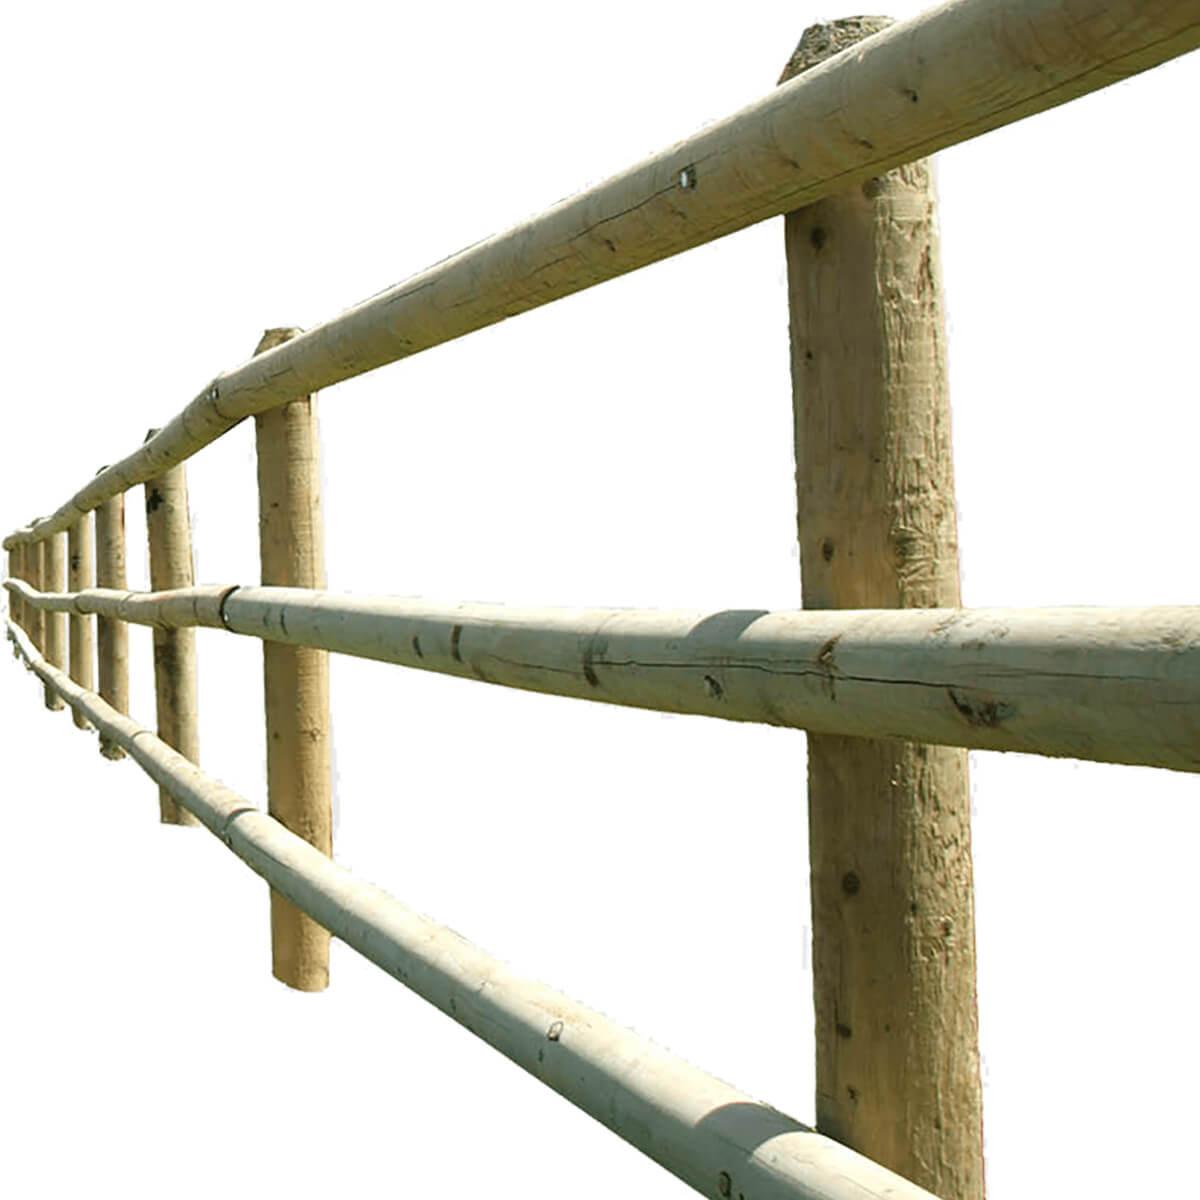 Dowelled Rail - Blunt - 3.5-in x 14-ft